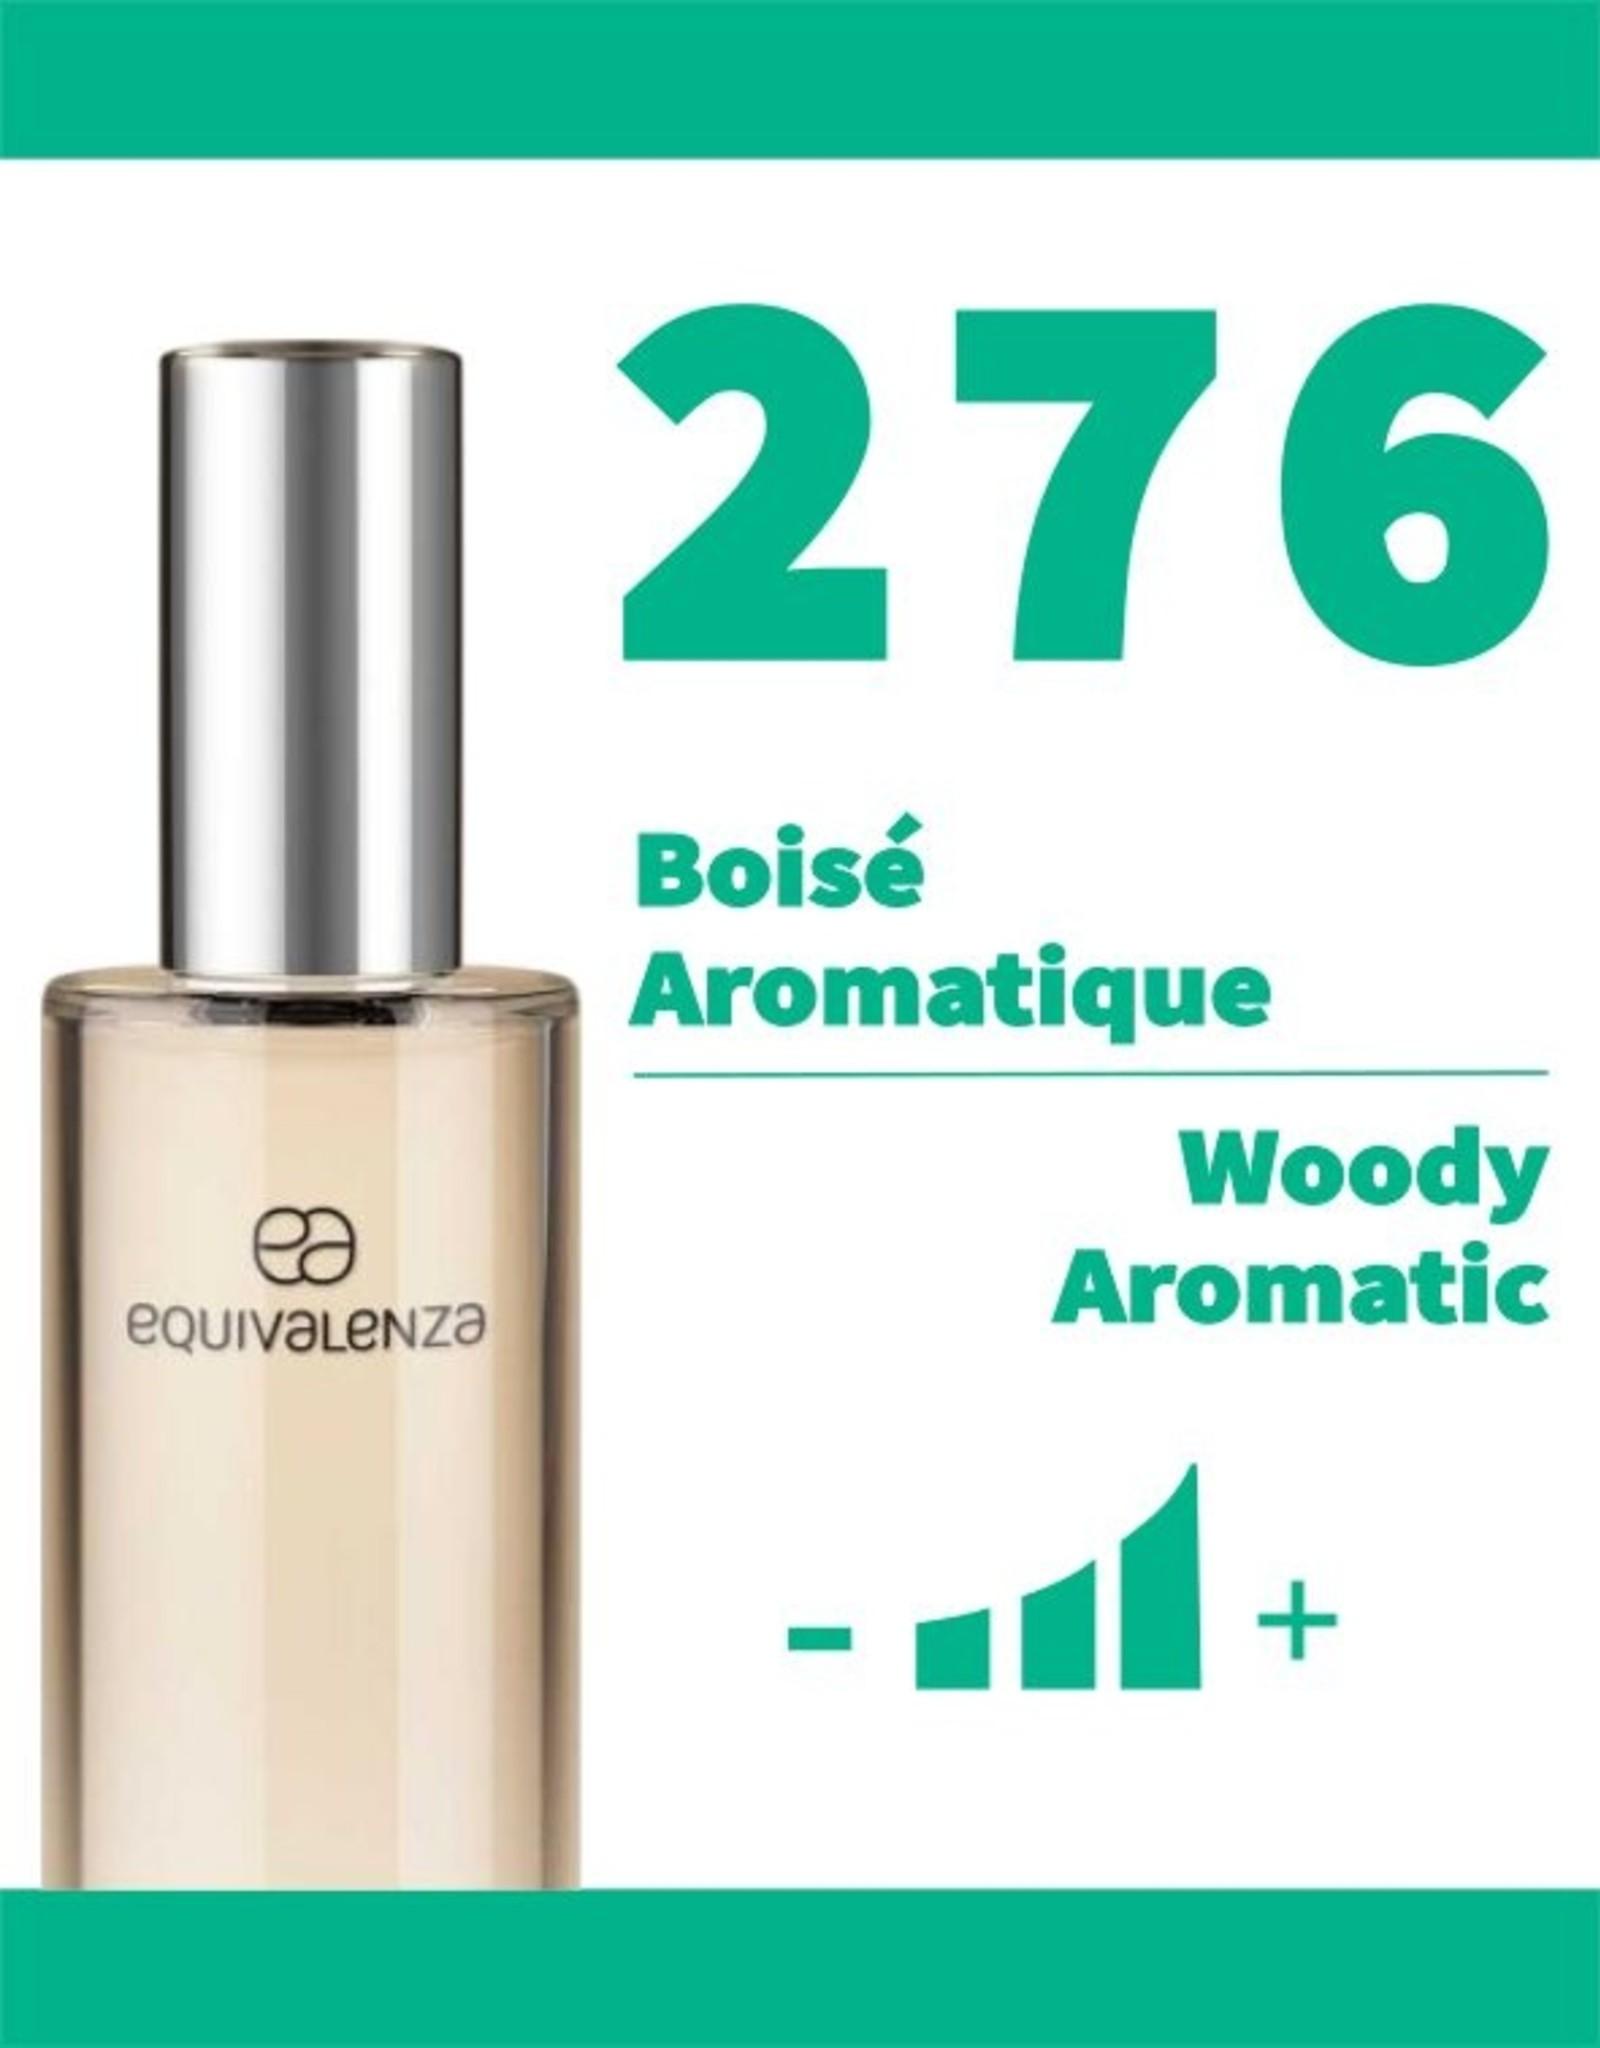 Equivalenza Woody Aromatic 276